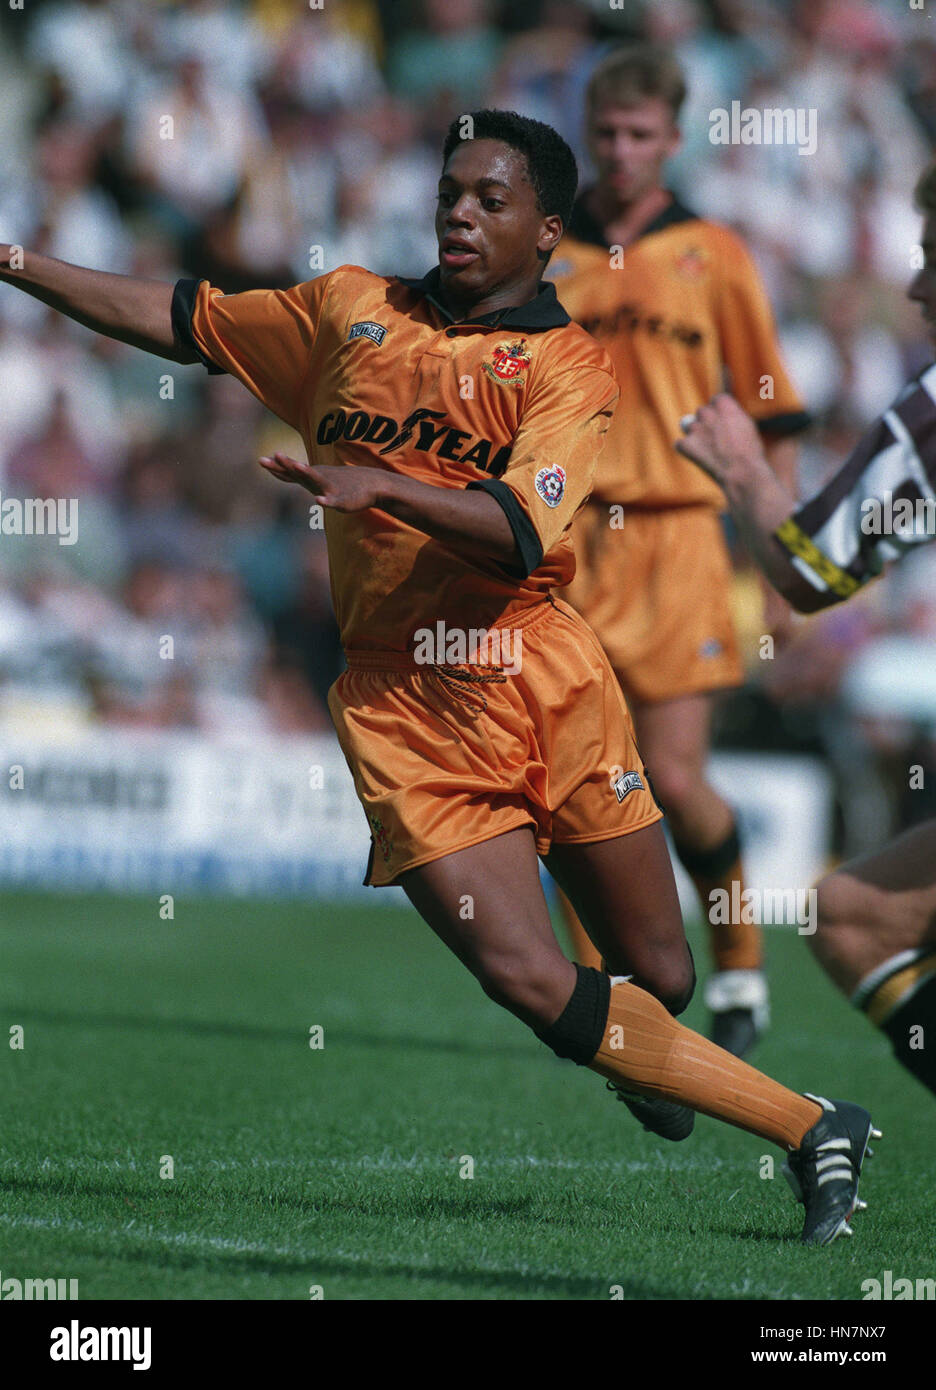 MARK RANKIN WOLVERHAMPTON WANDERERS FC 24 August 1994 - Stock Image